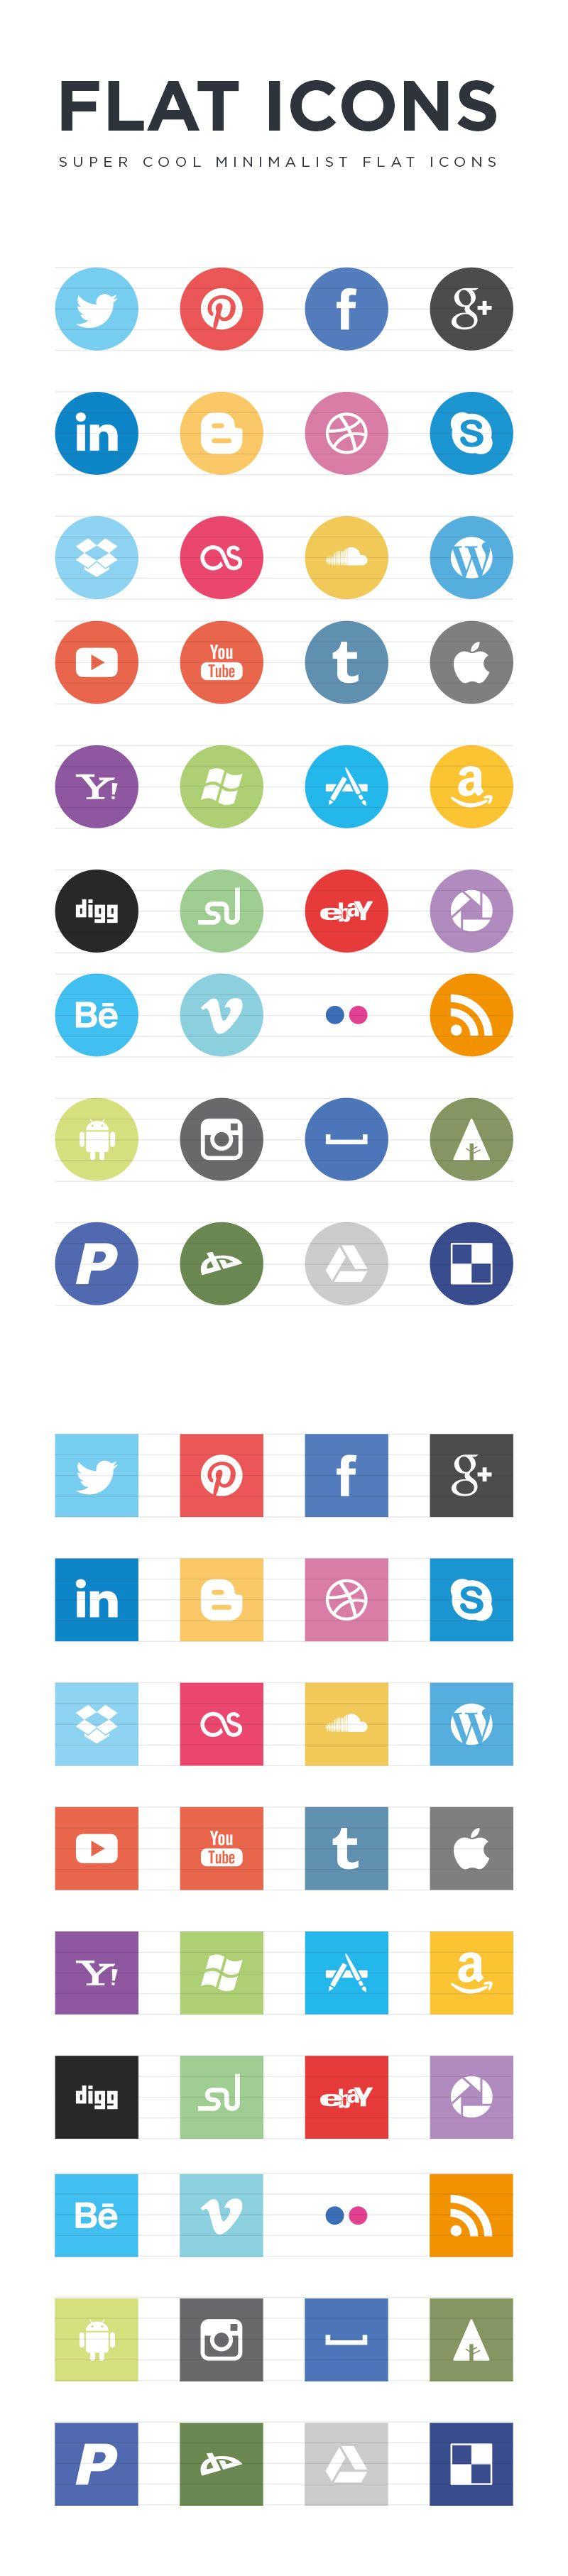 Exclusive FREE liquorice pompom tutorial Social icons